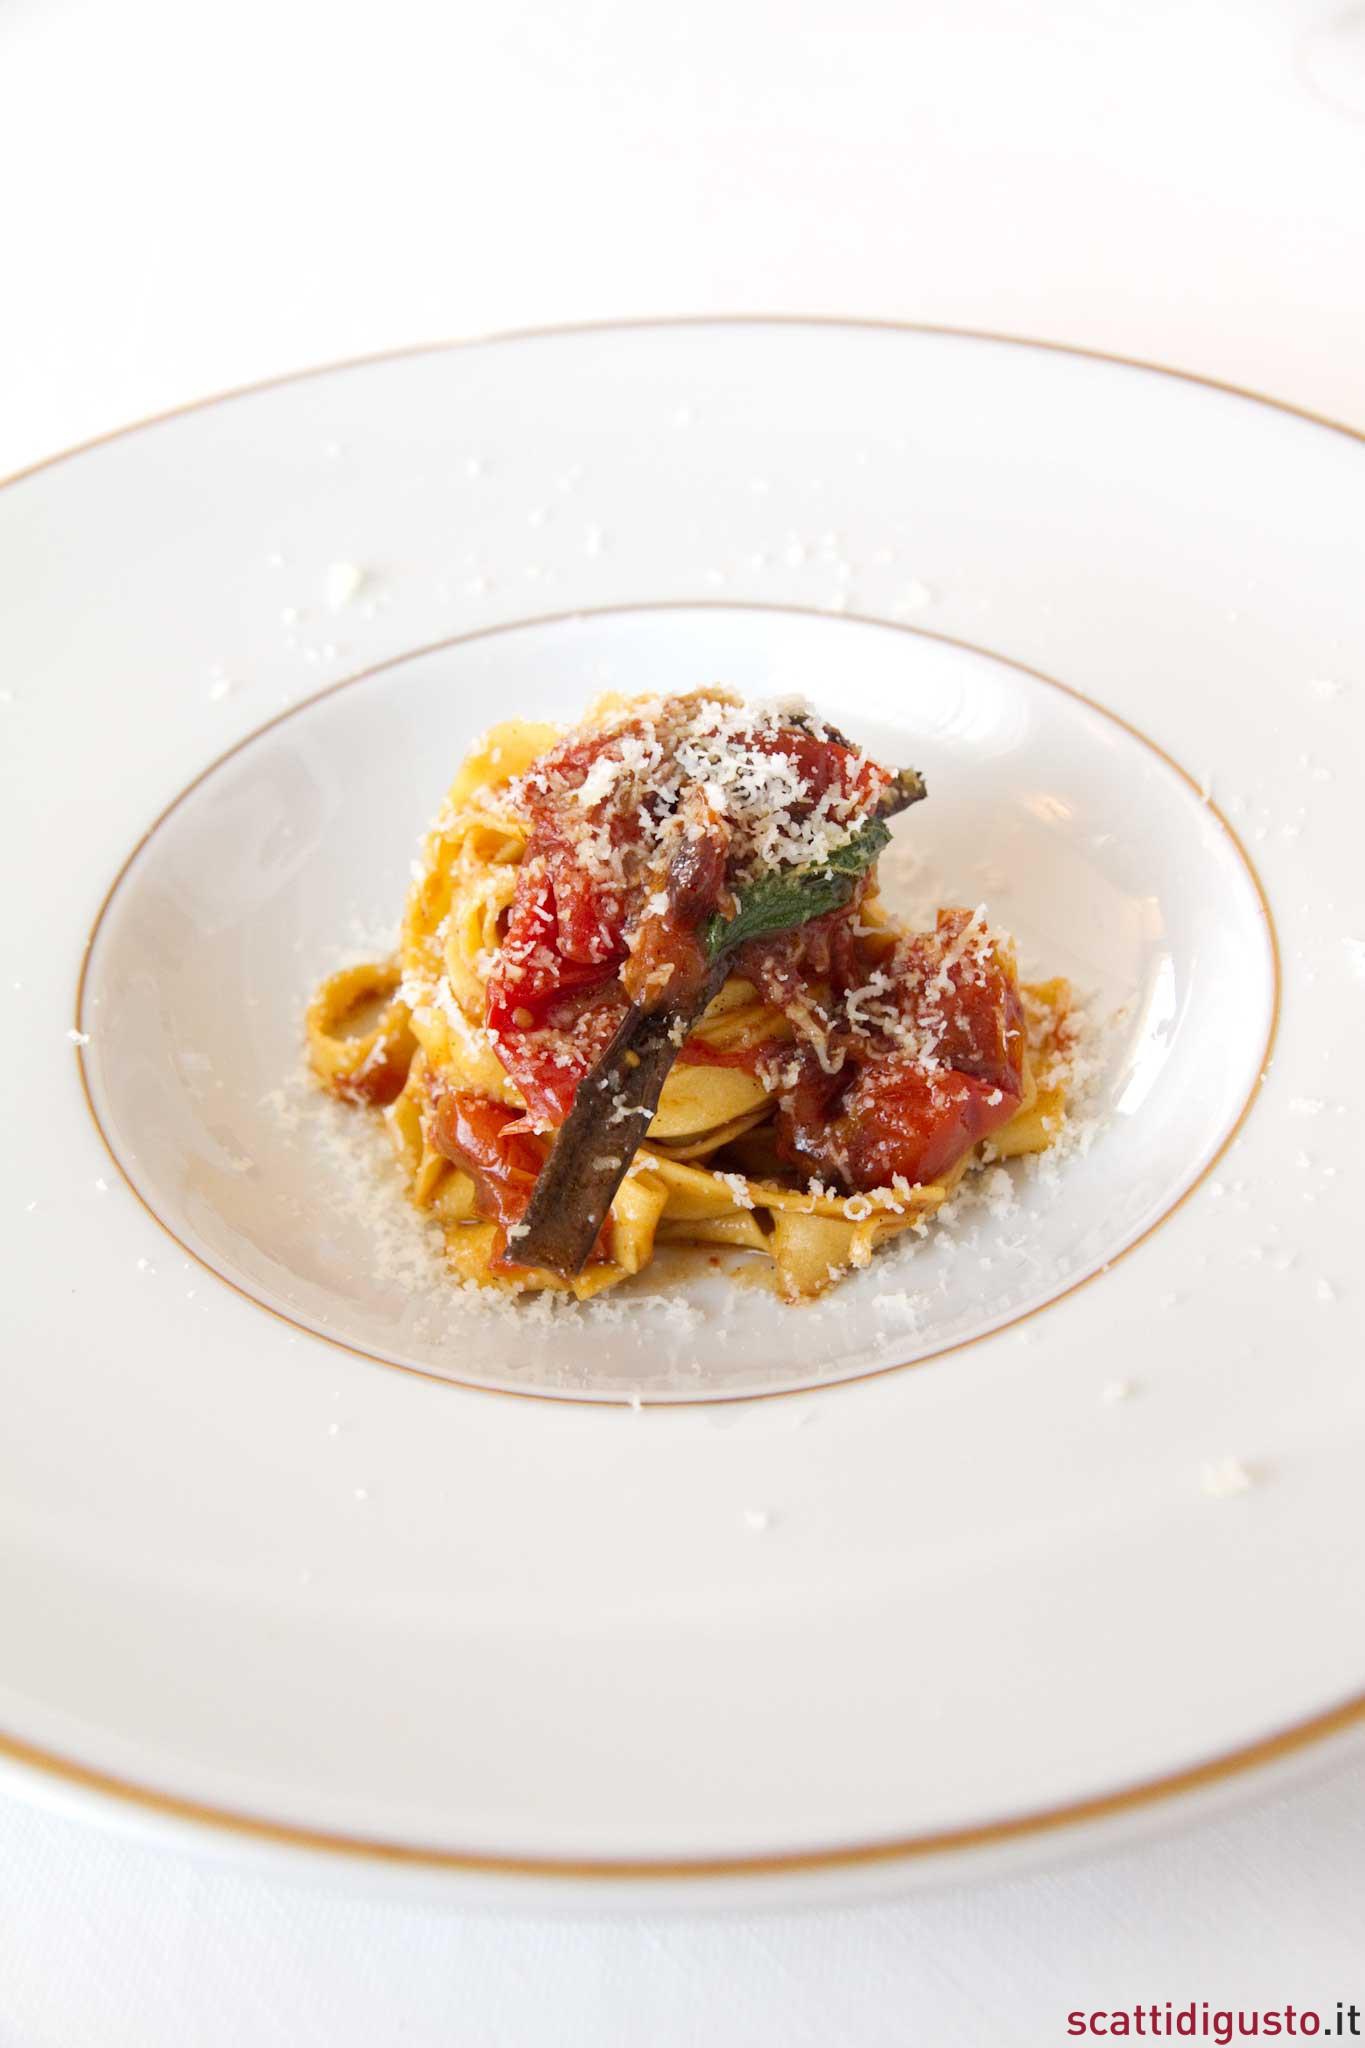 Fettuccine pomodorini brace Tassa